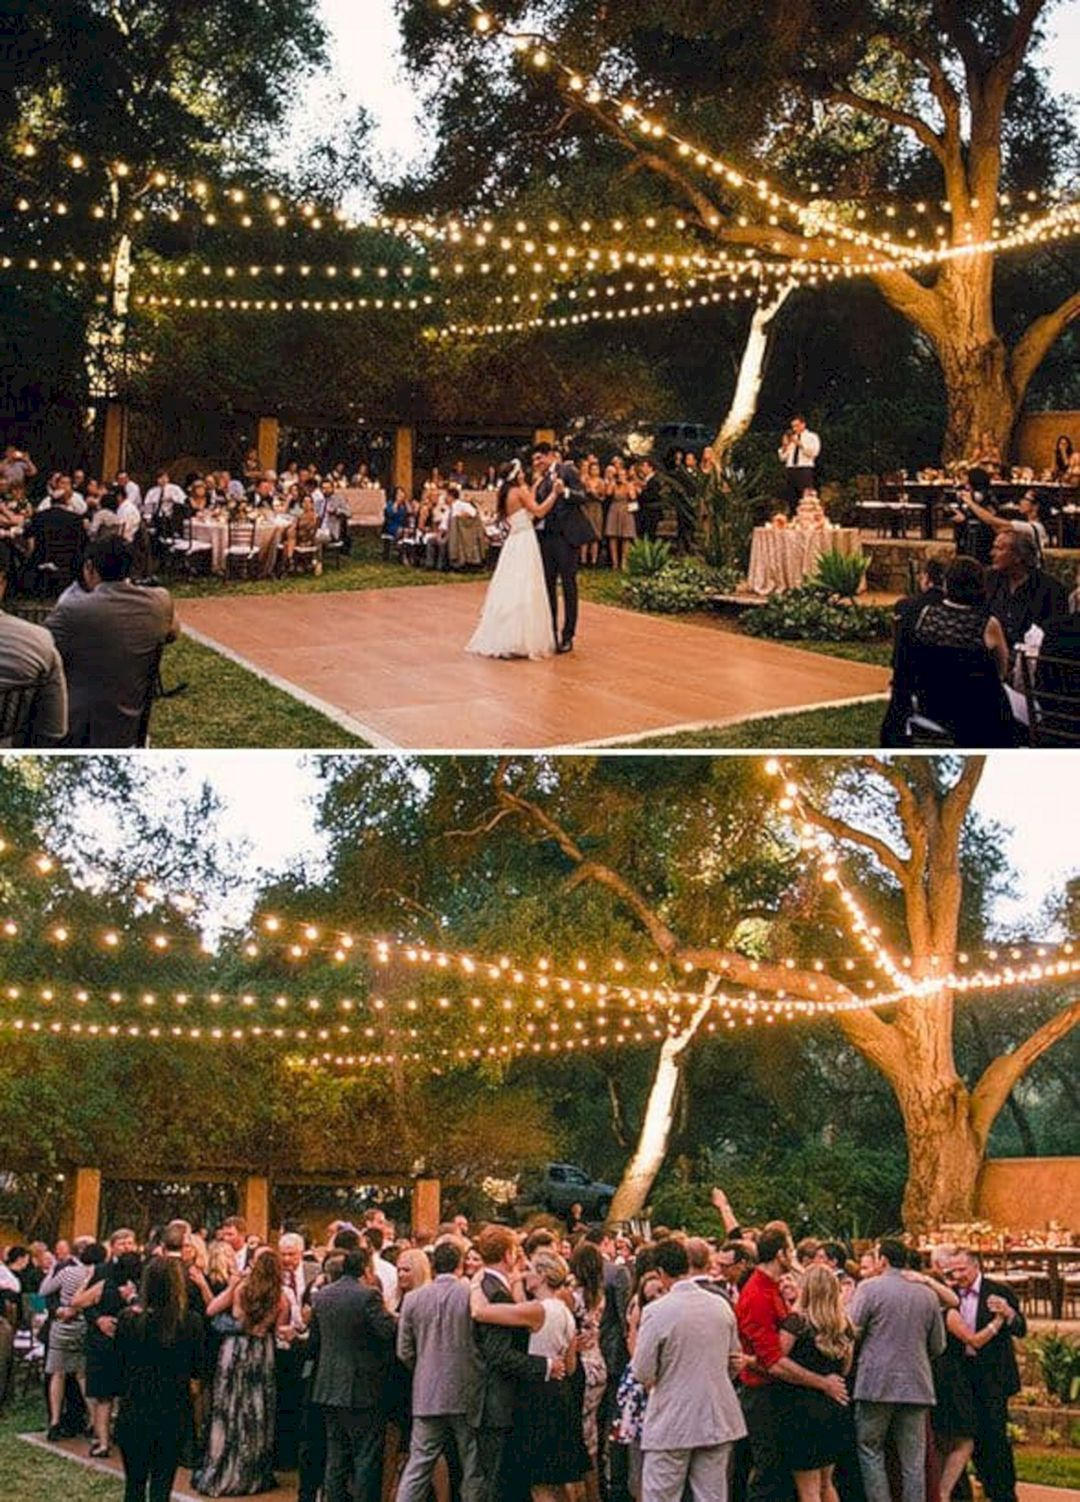 23 Elegant Outdoor Wedding Lighting Design Ideas For Fantastic Wedding Party Outdoor Wedding Lighting Cheap Backyard Wedding Dance Floor Wedding